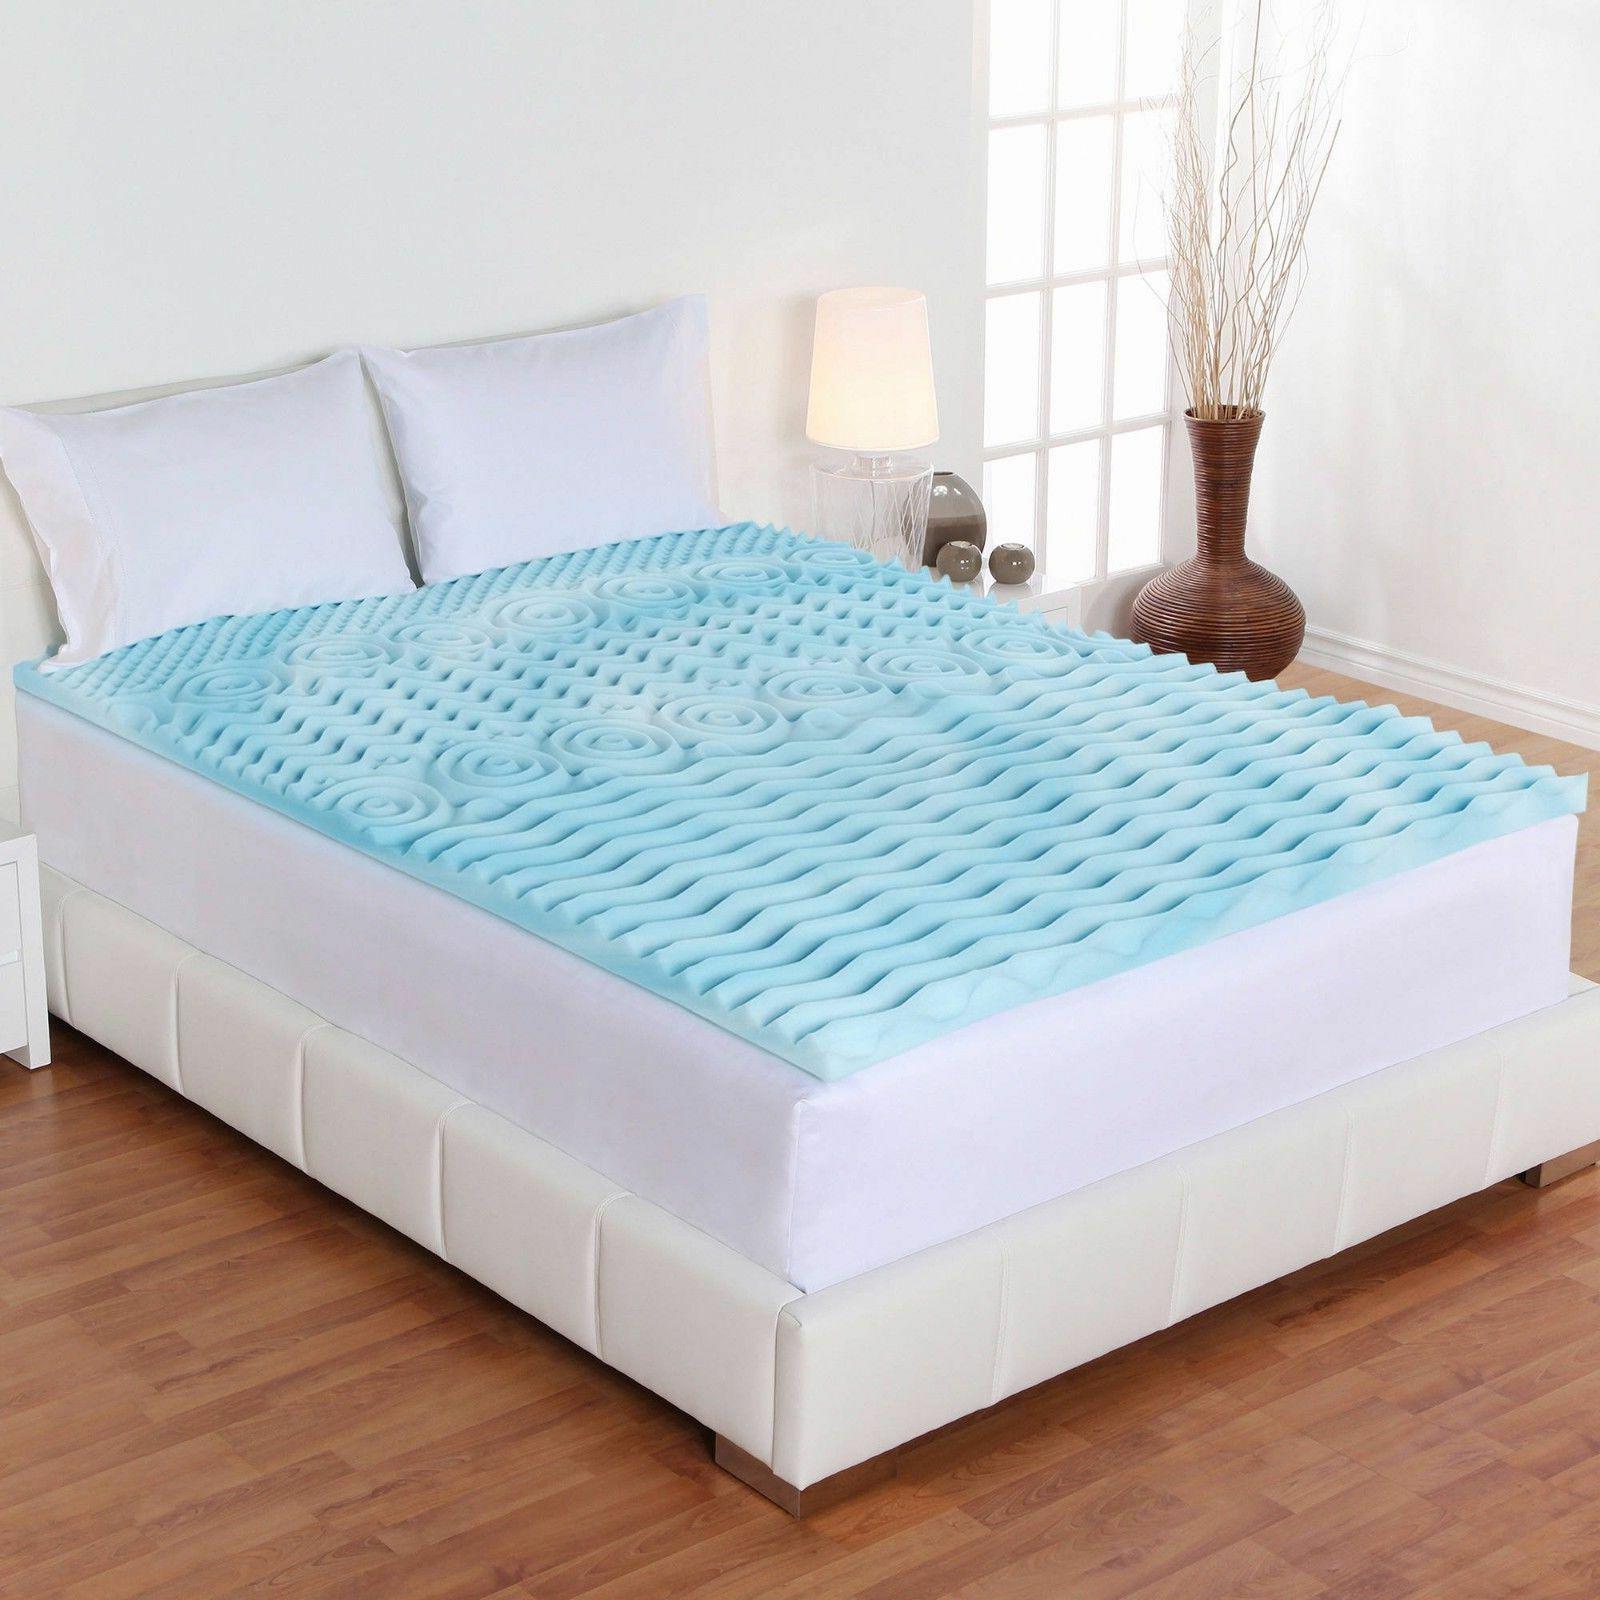 Mattress Topper Foam Bed Cover Firm-Full King